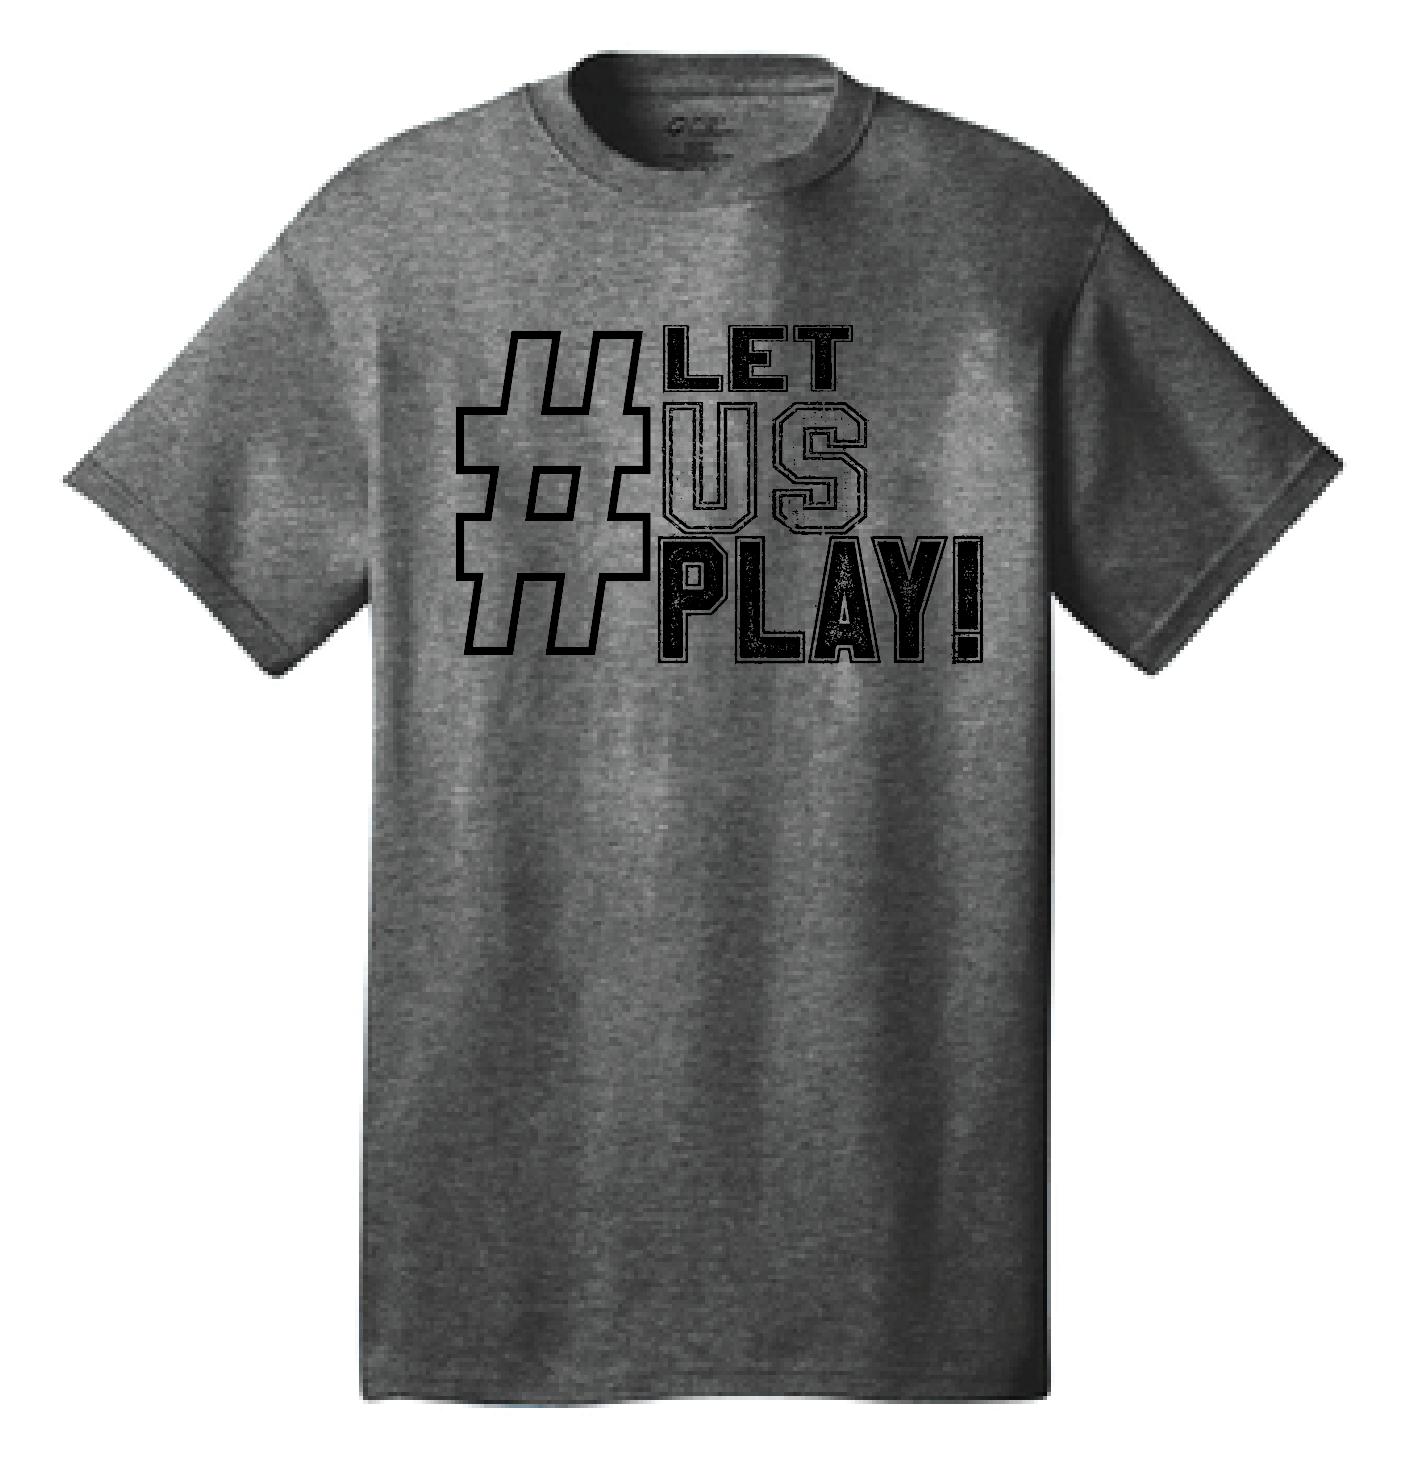 Let US Play D3 tee